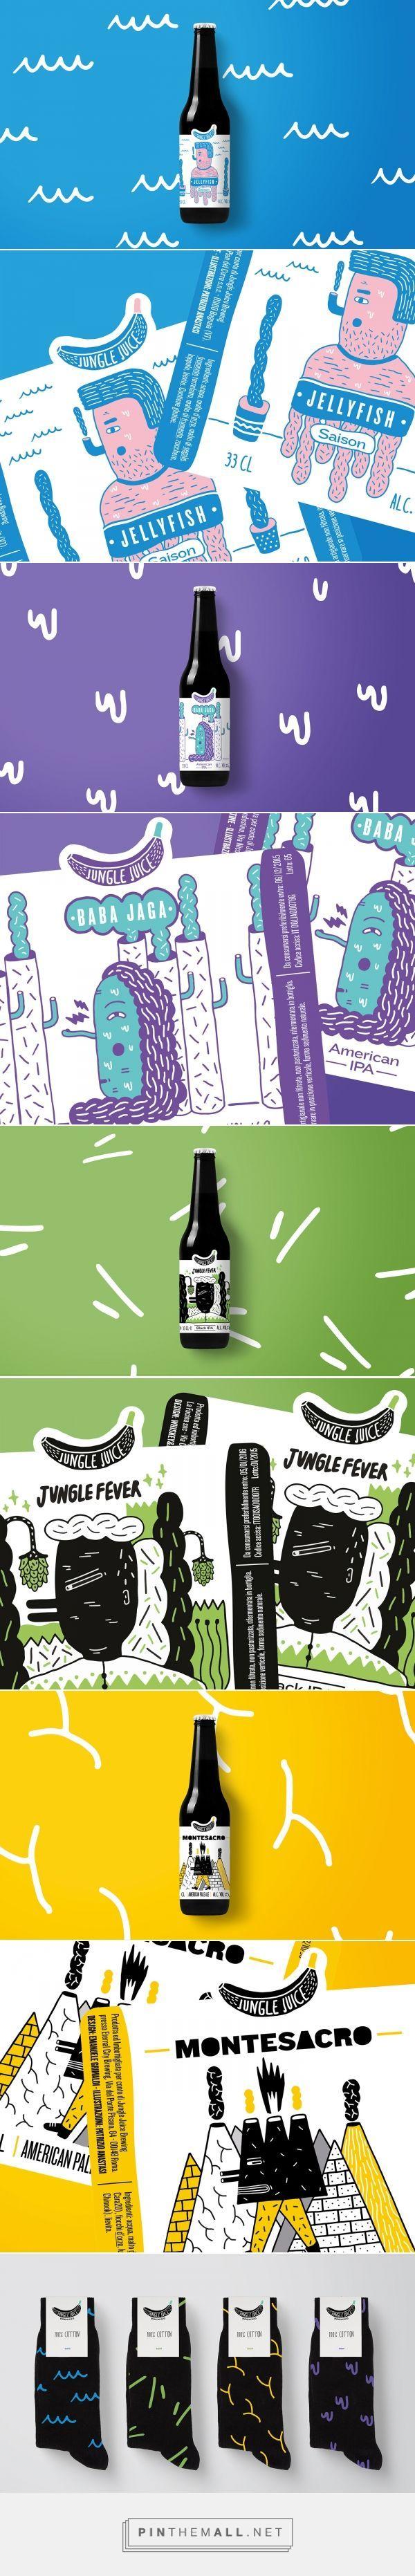 Jungle Juice by Roberta Farese, Emanuele Grimaldi, We meet Brands, Matteo Modena: